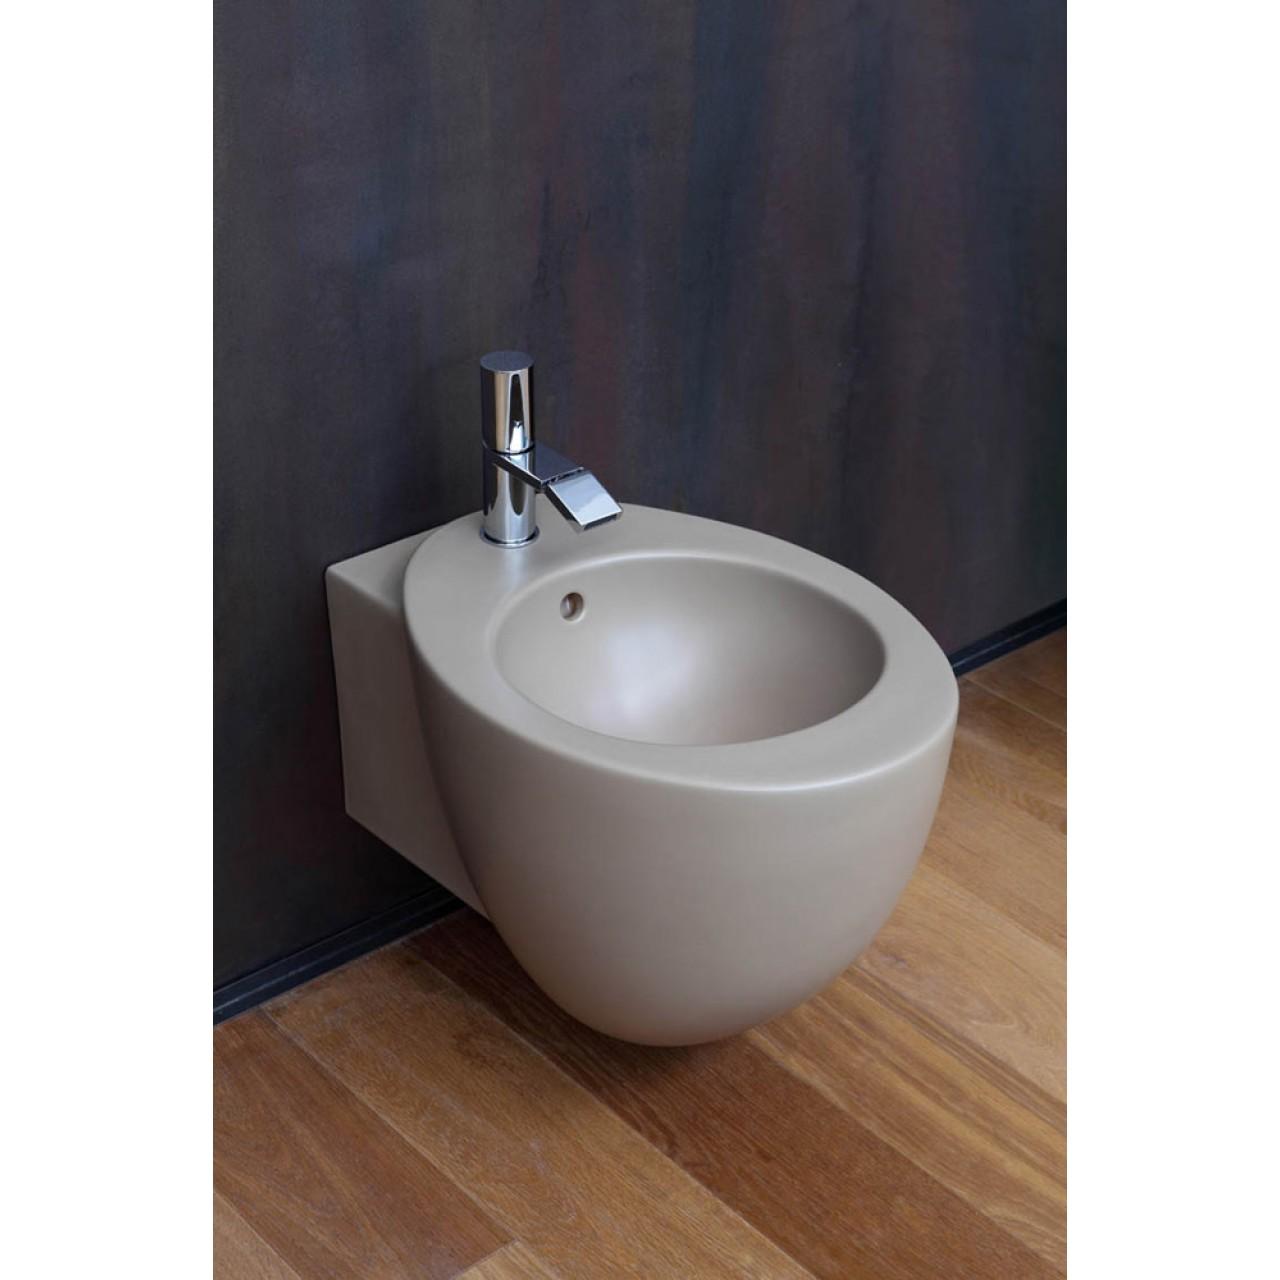 Le Giare WC & Bidet